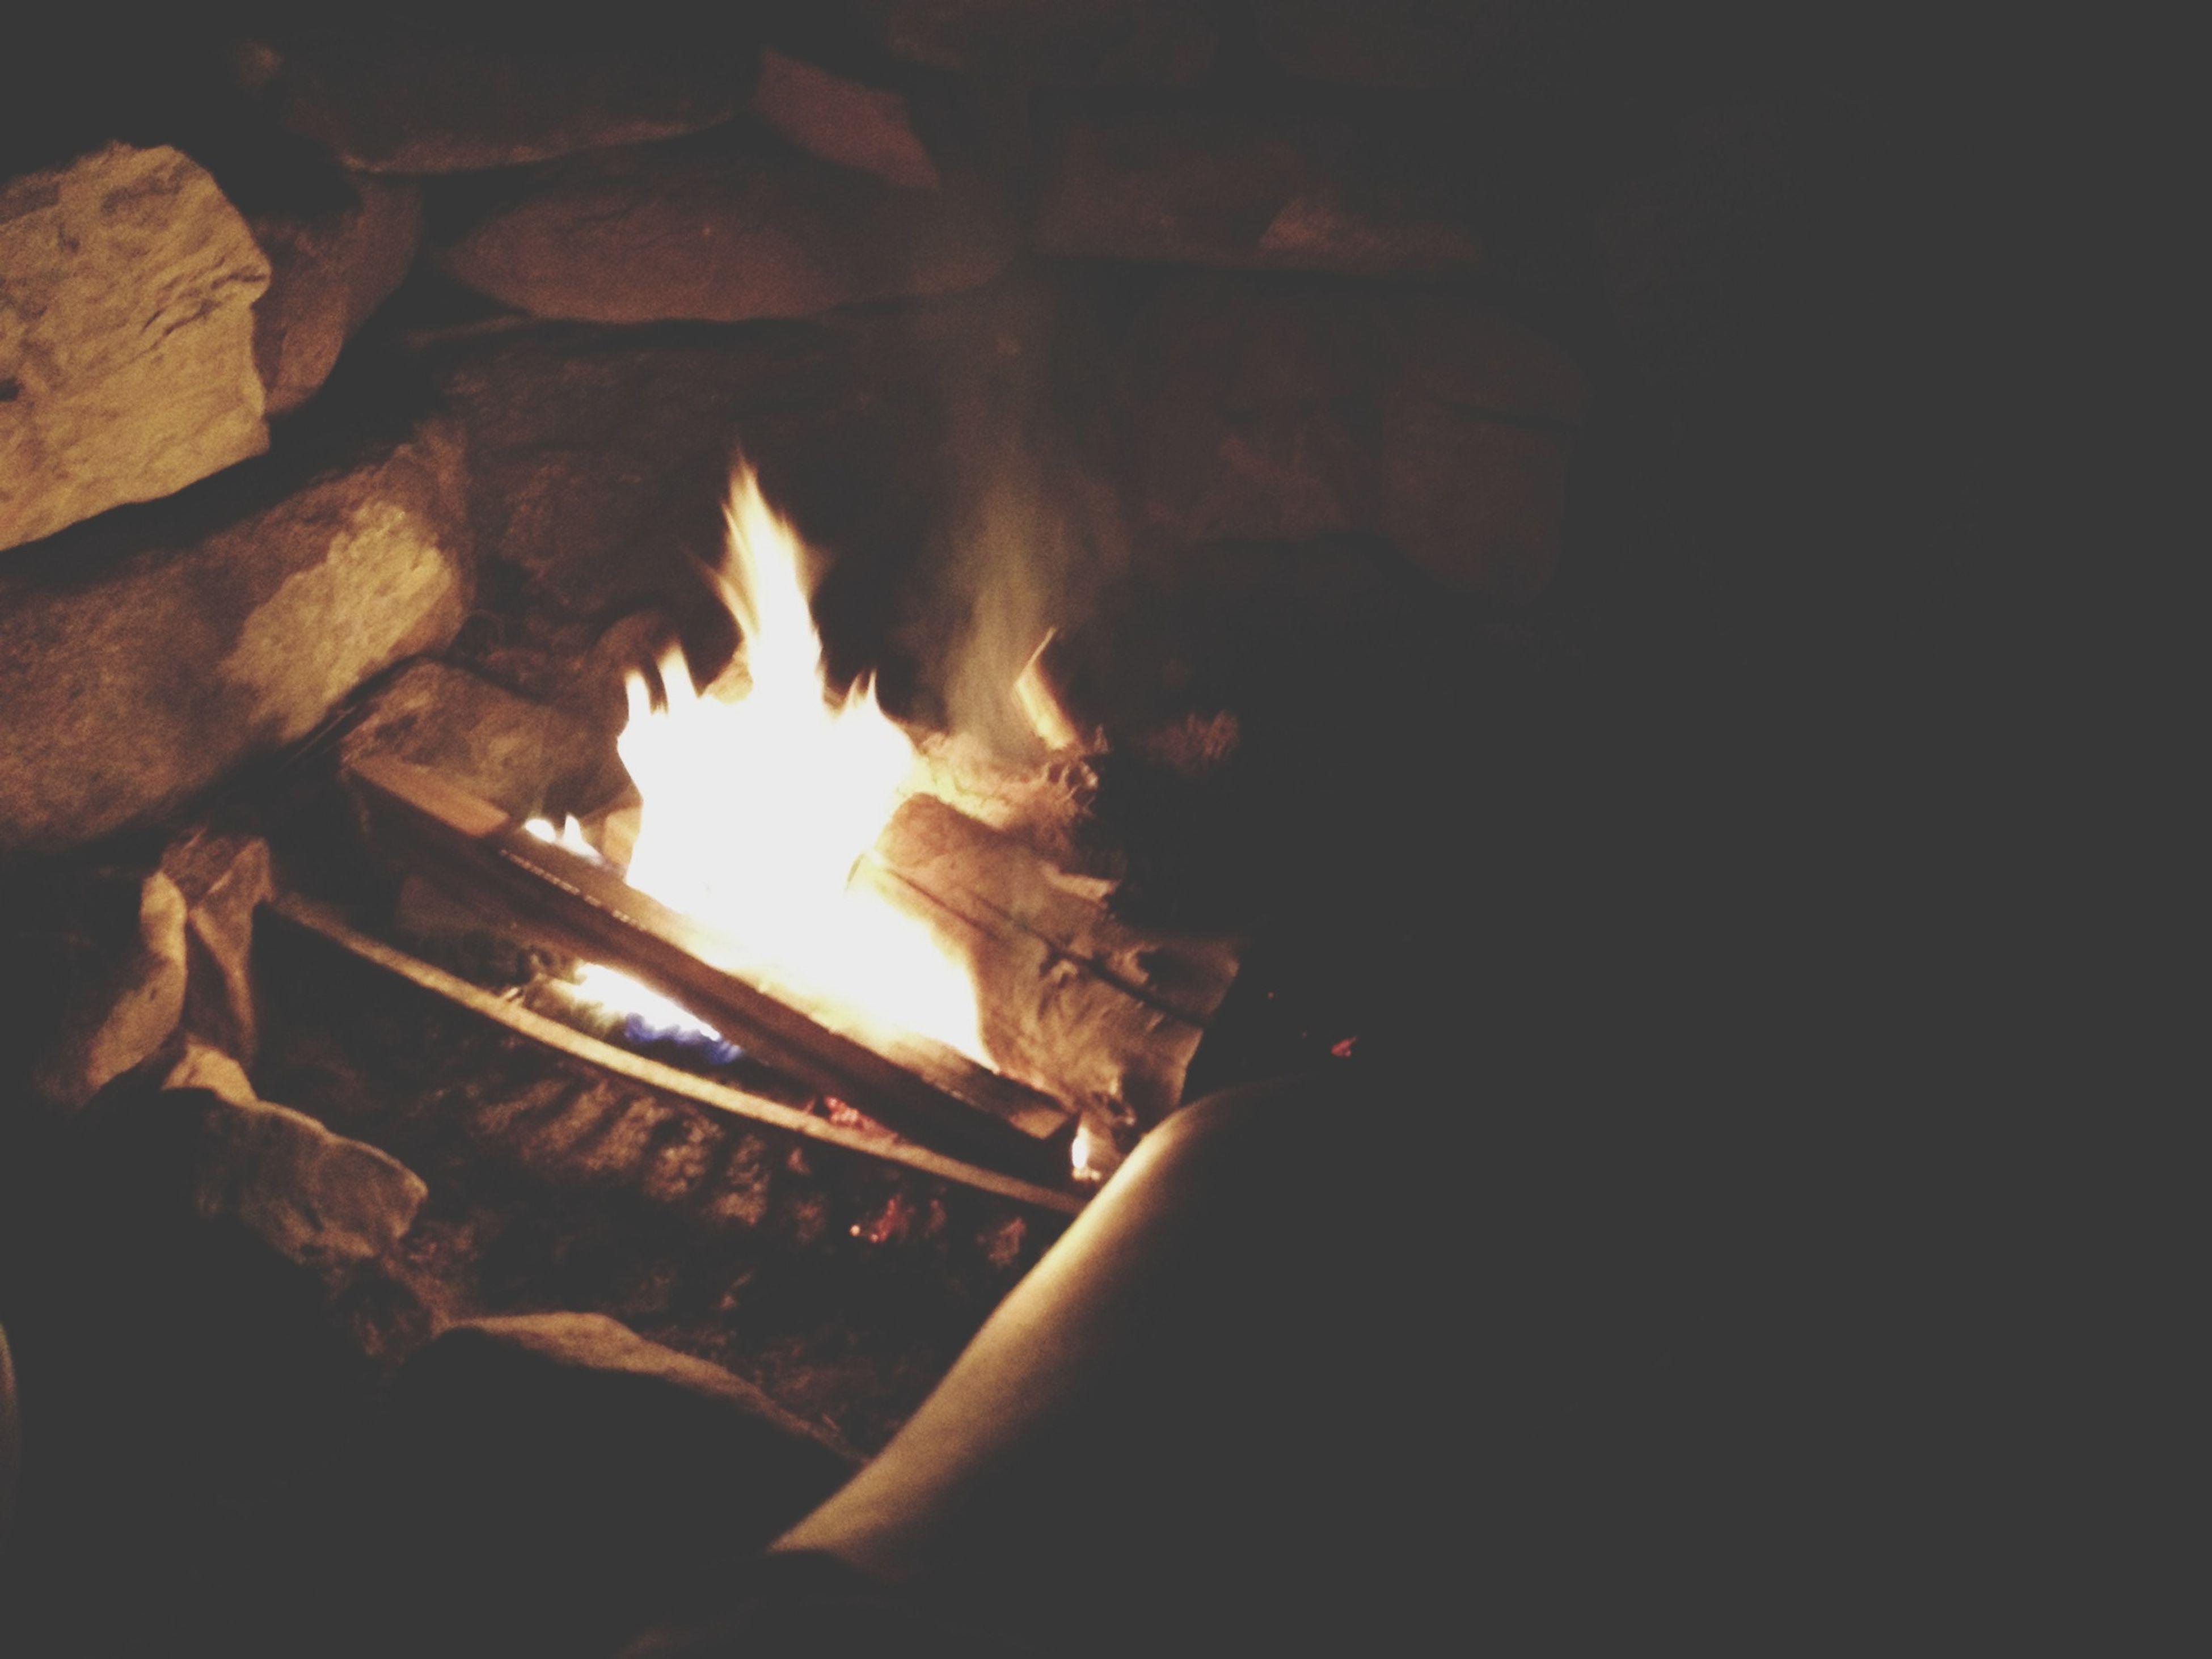 flame, burning, fire - natural phenomenon, heat - temperature, fire, glowing, night, bonfire, heat, firewood, indoors, illuminated, dark, close-up, campfire, light - natural phenomenon, candle, fireplace, no people